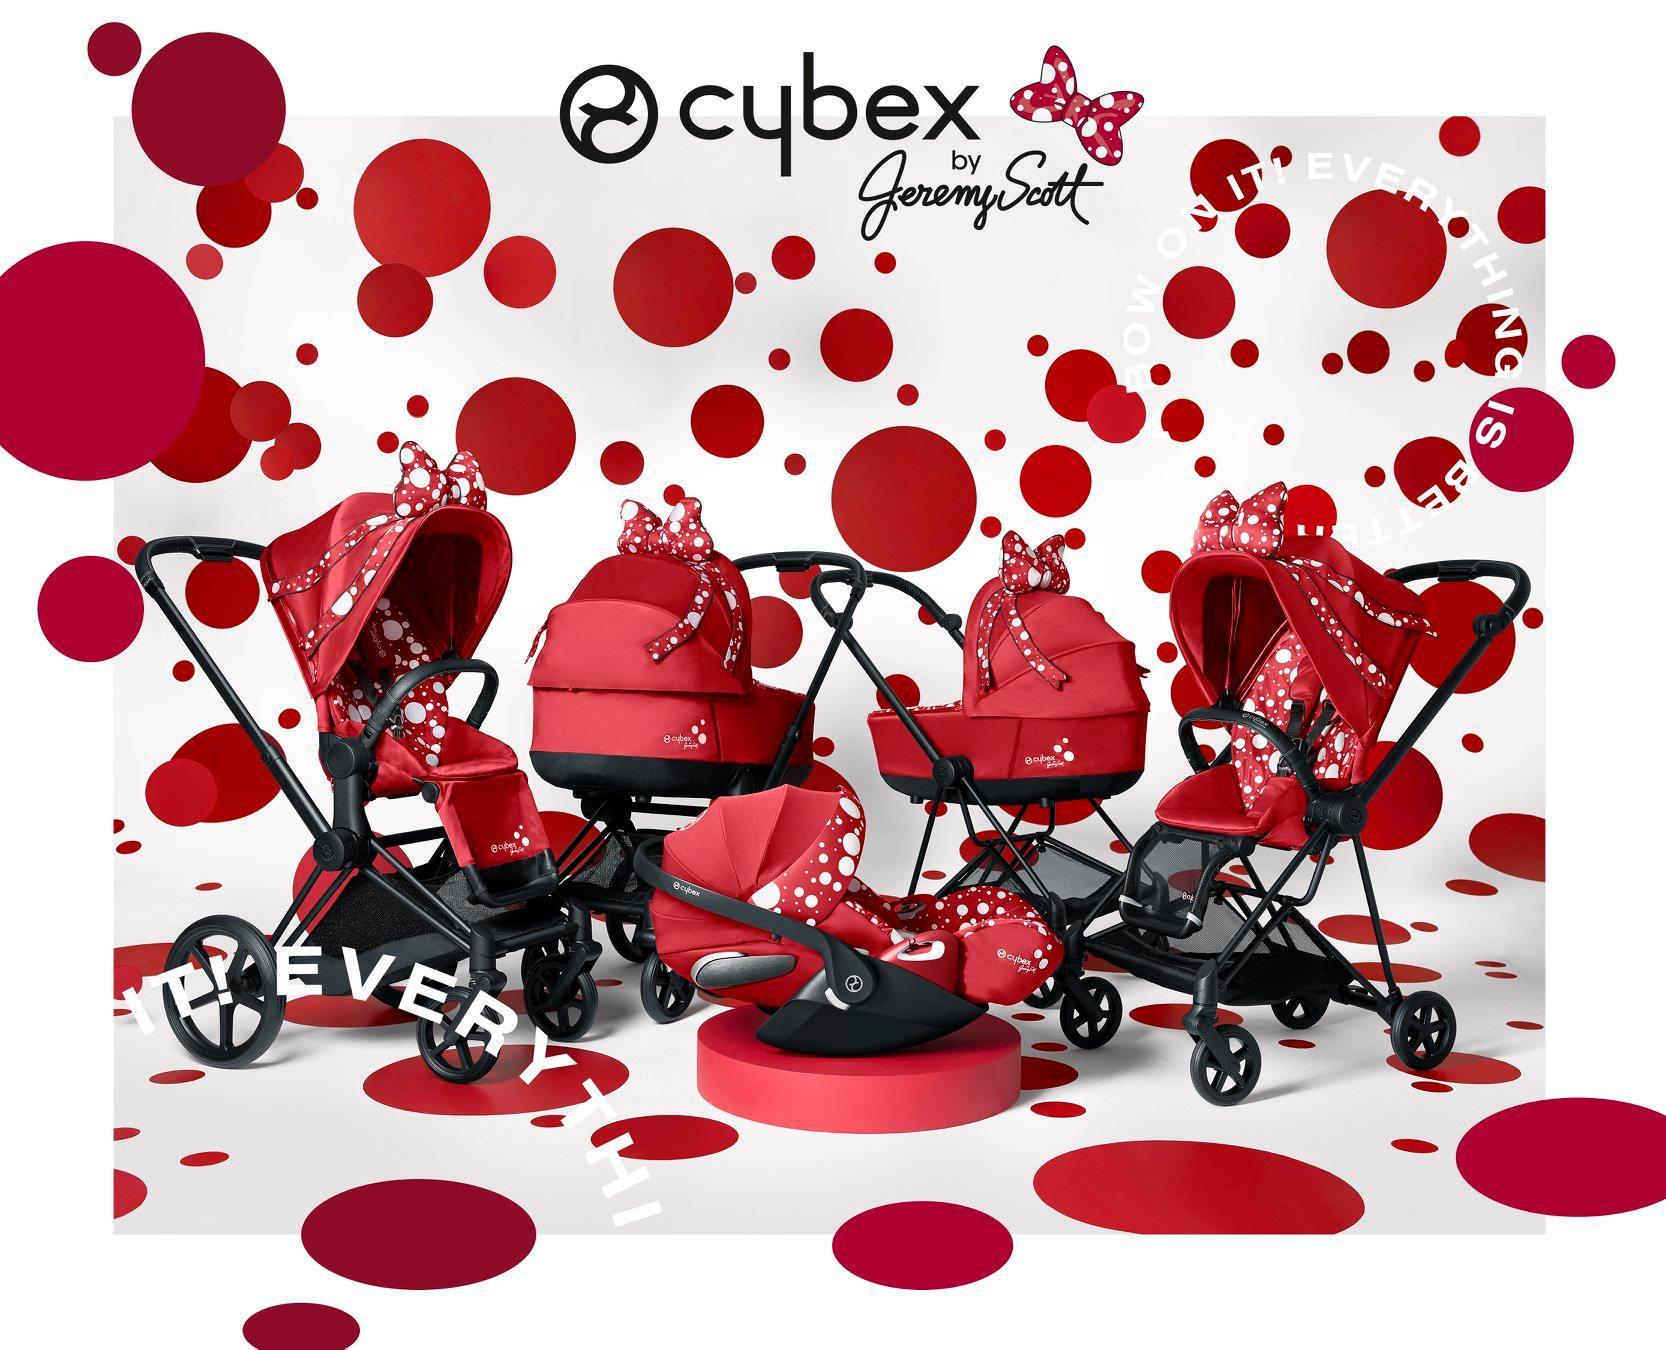 Cybex - Petticoat Red